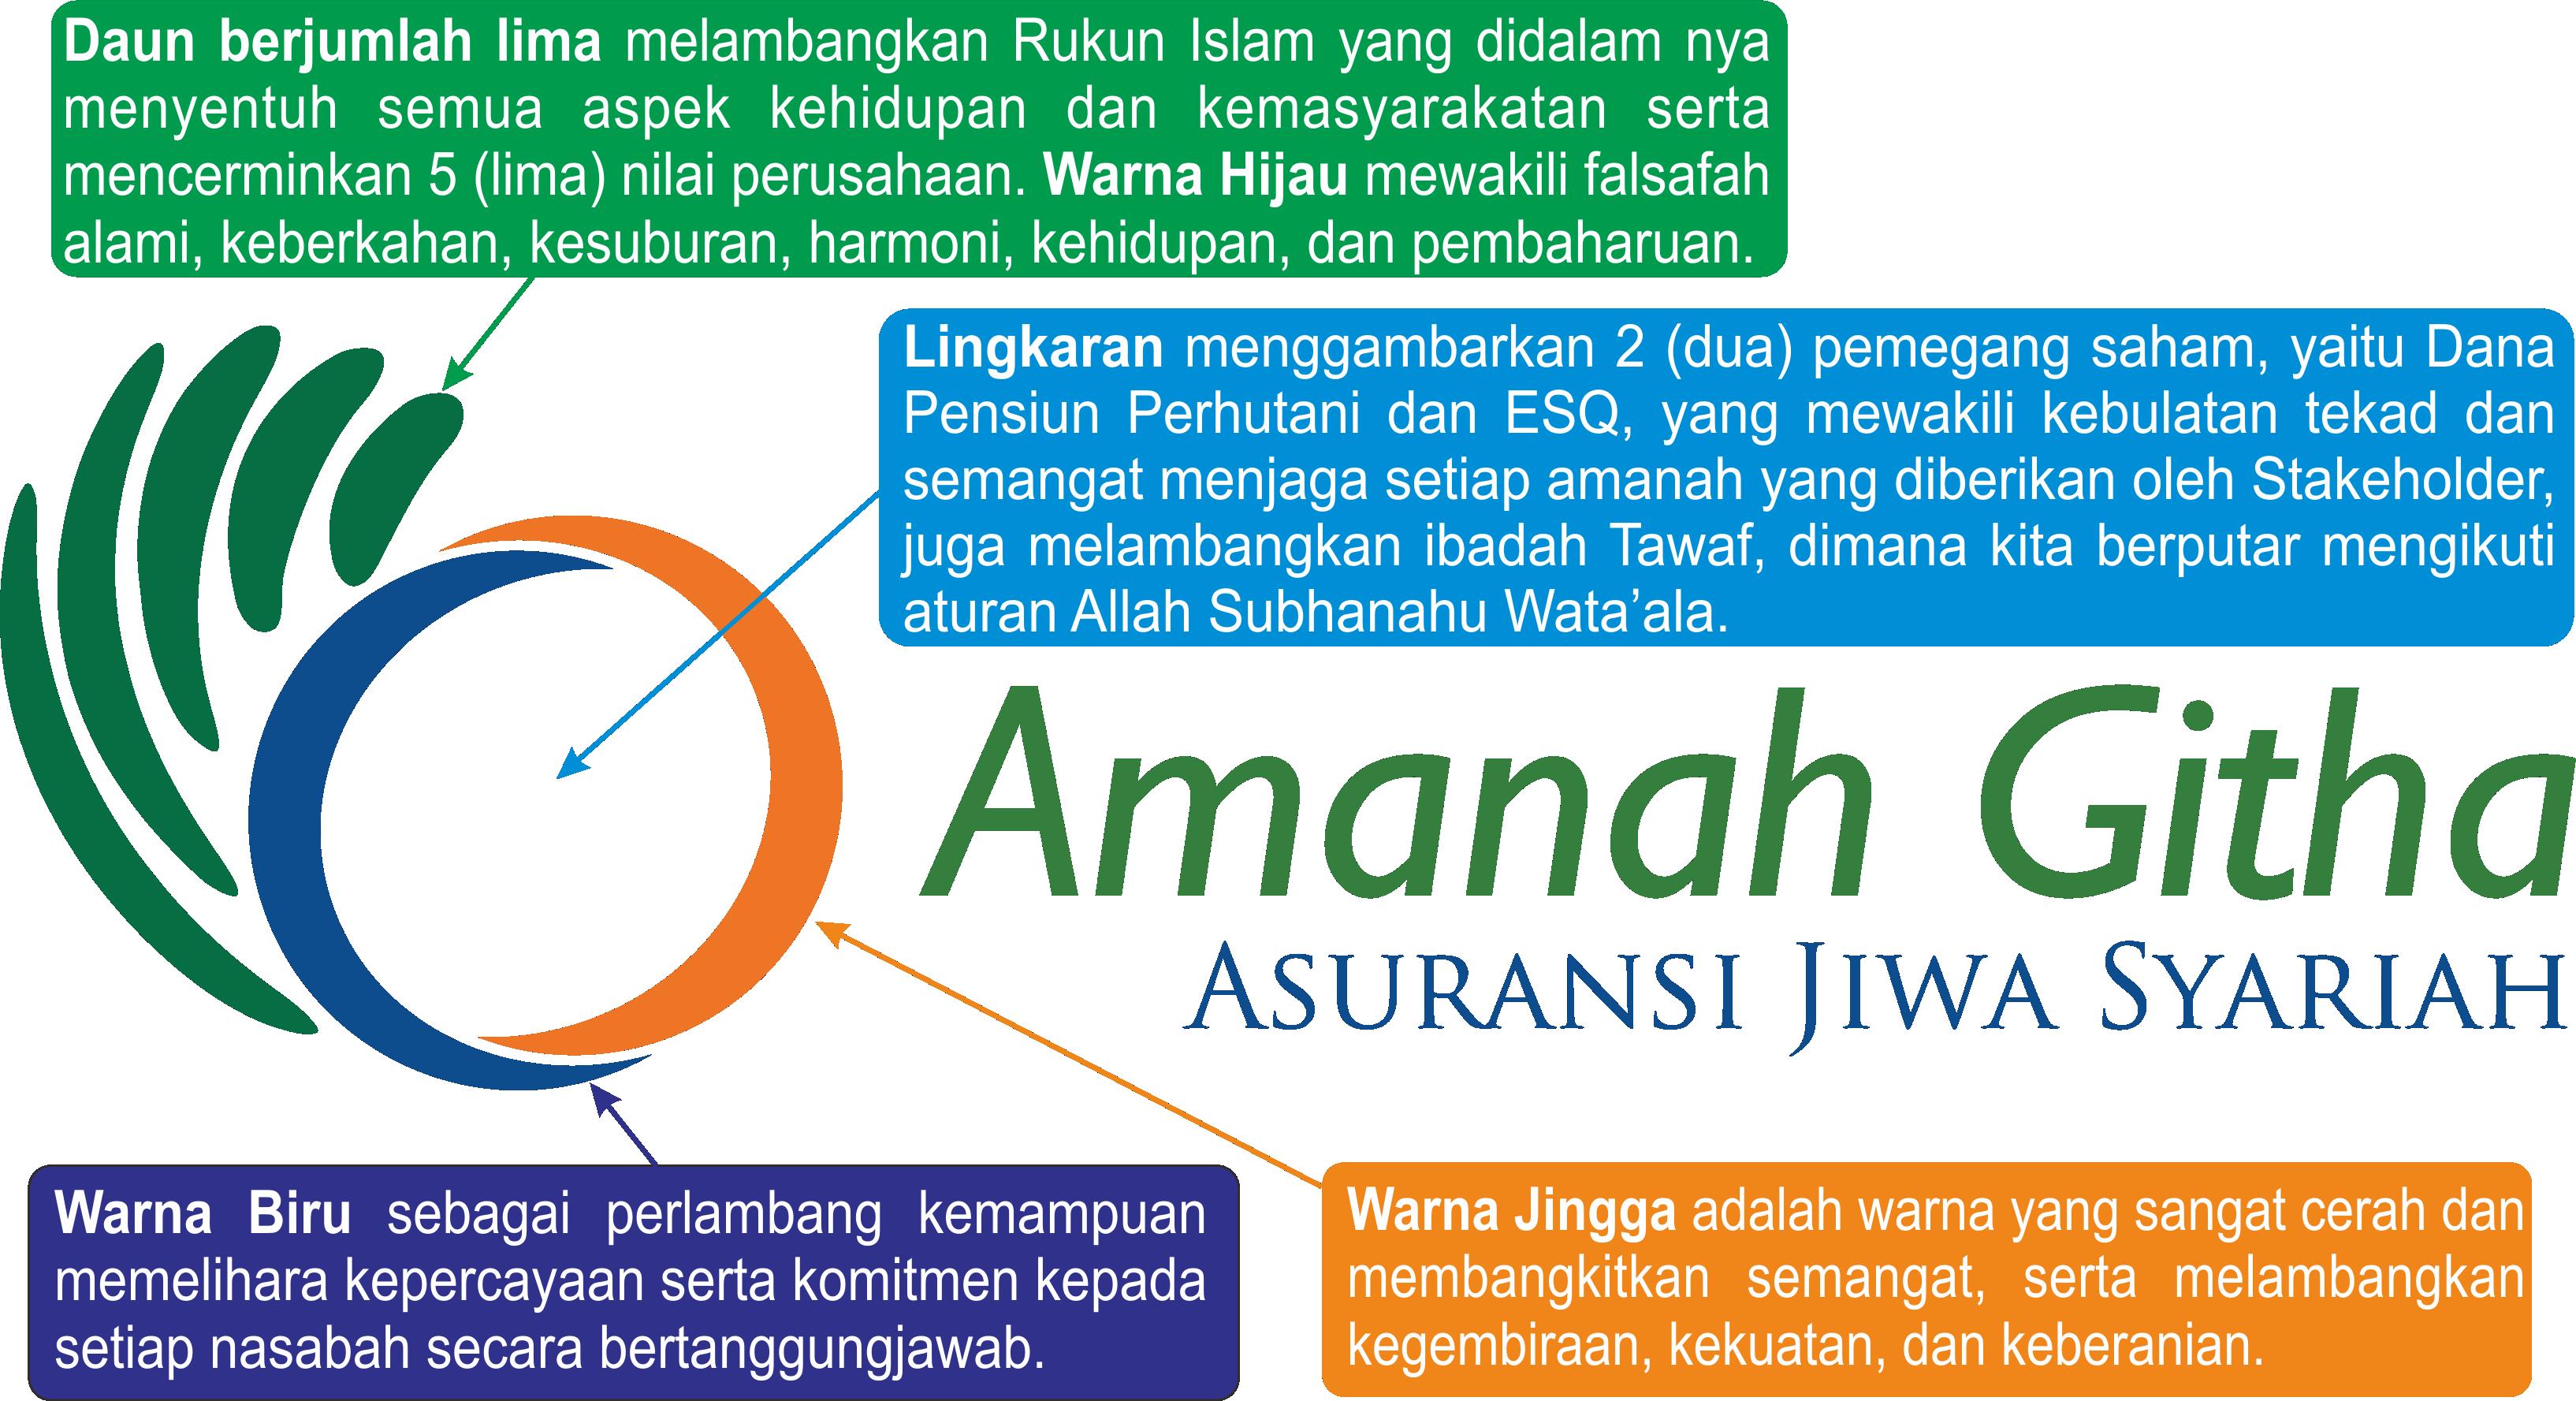 Logo Amanah Githa